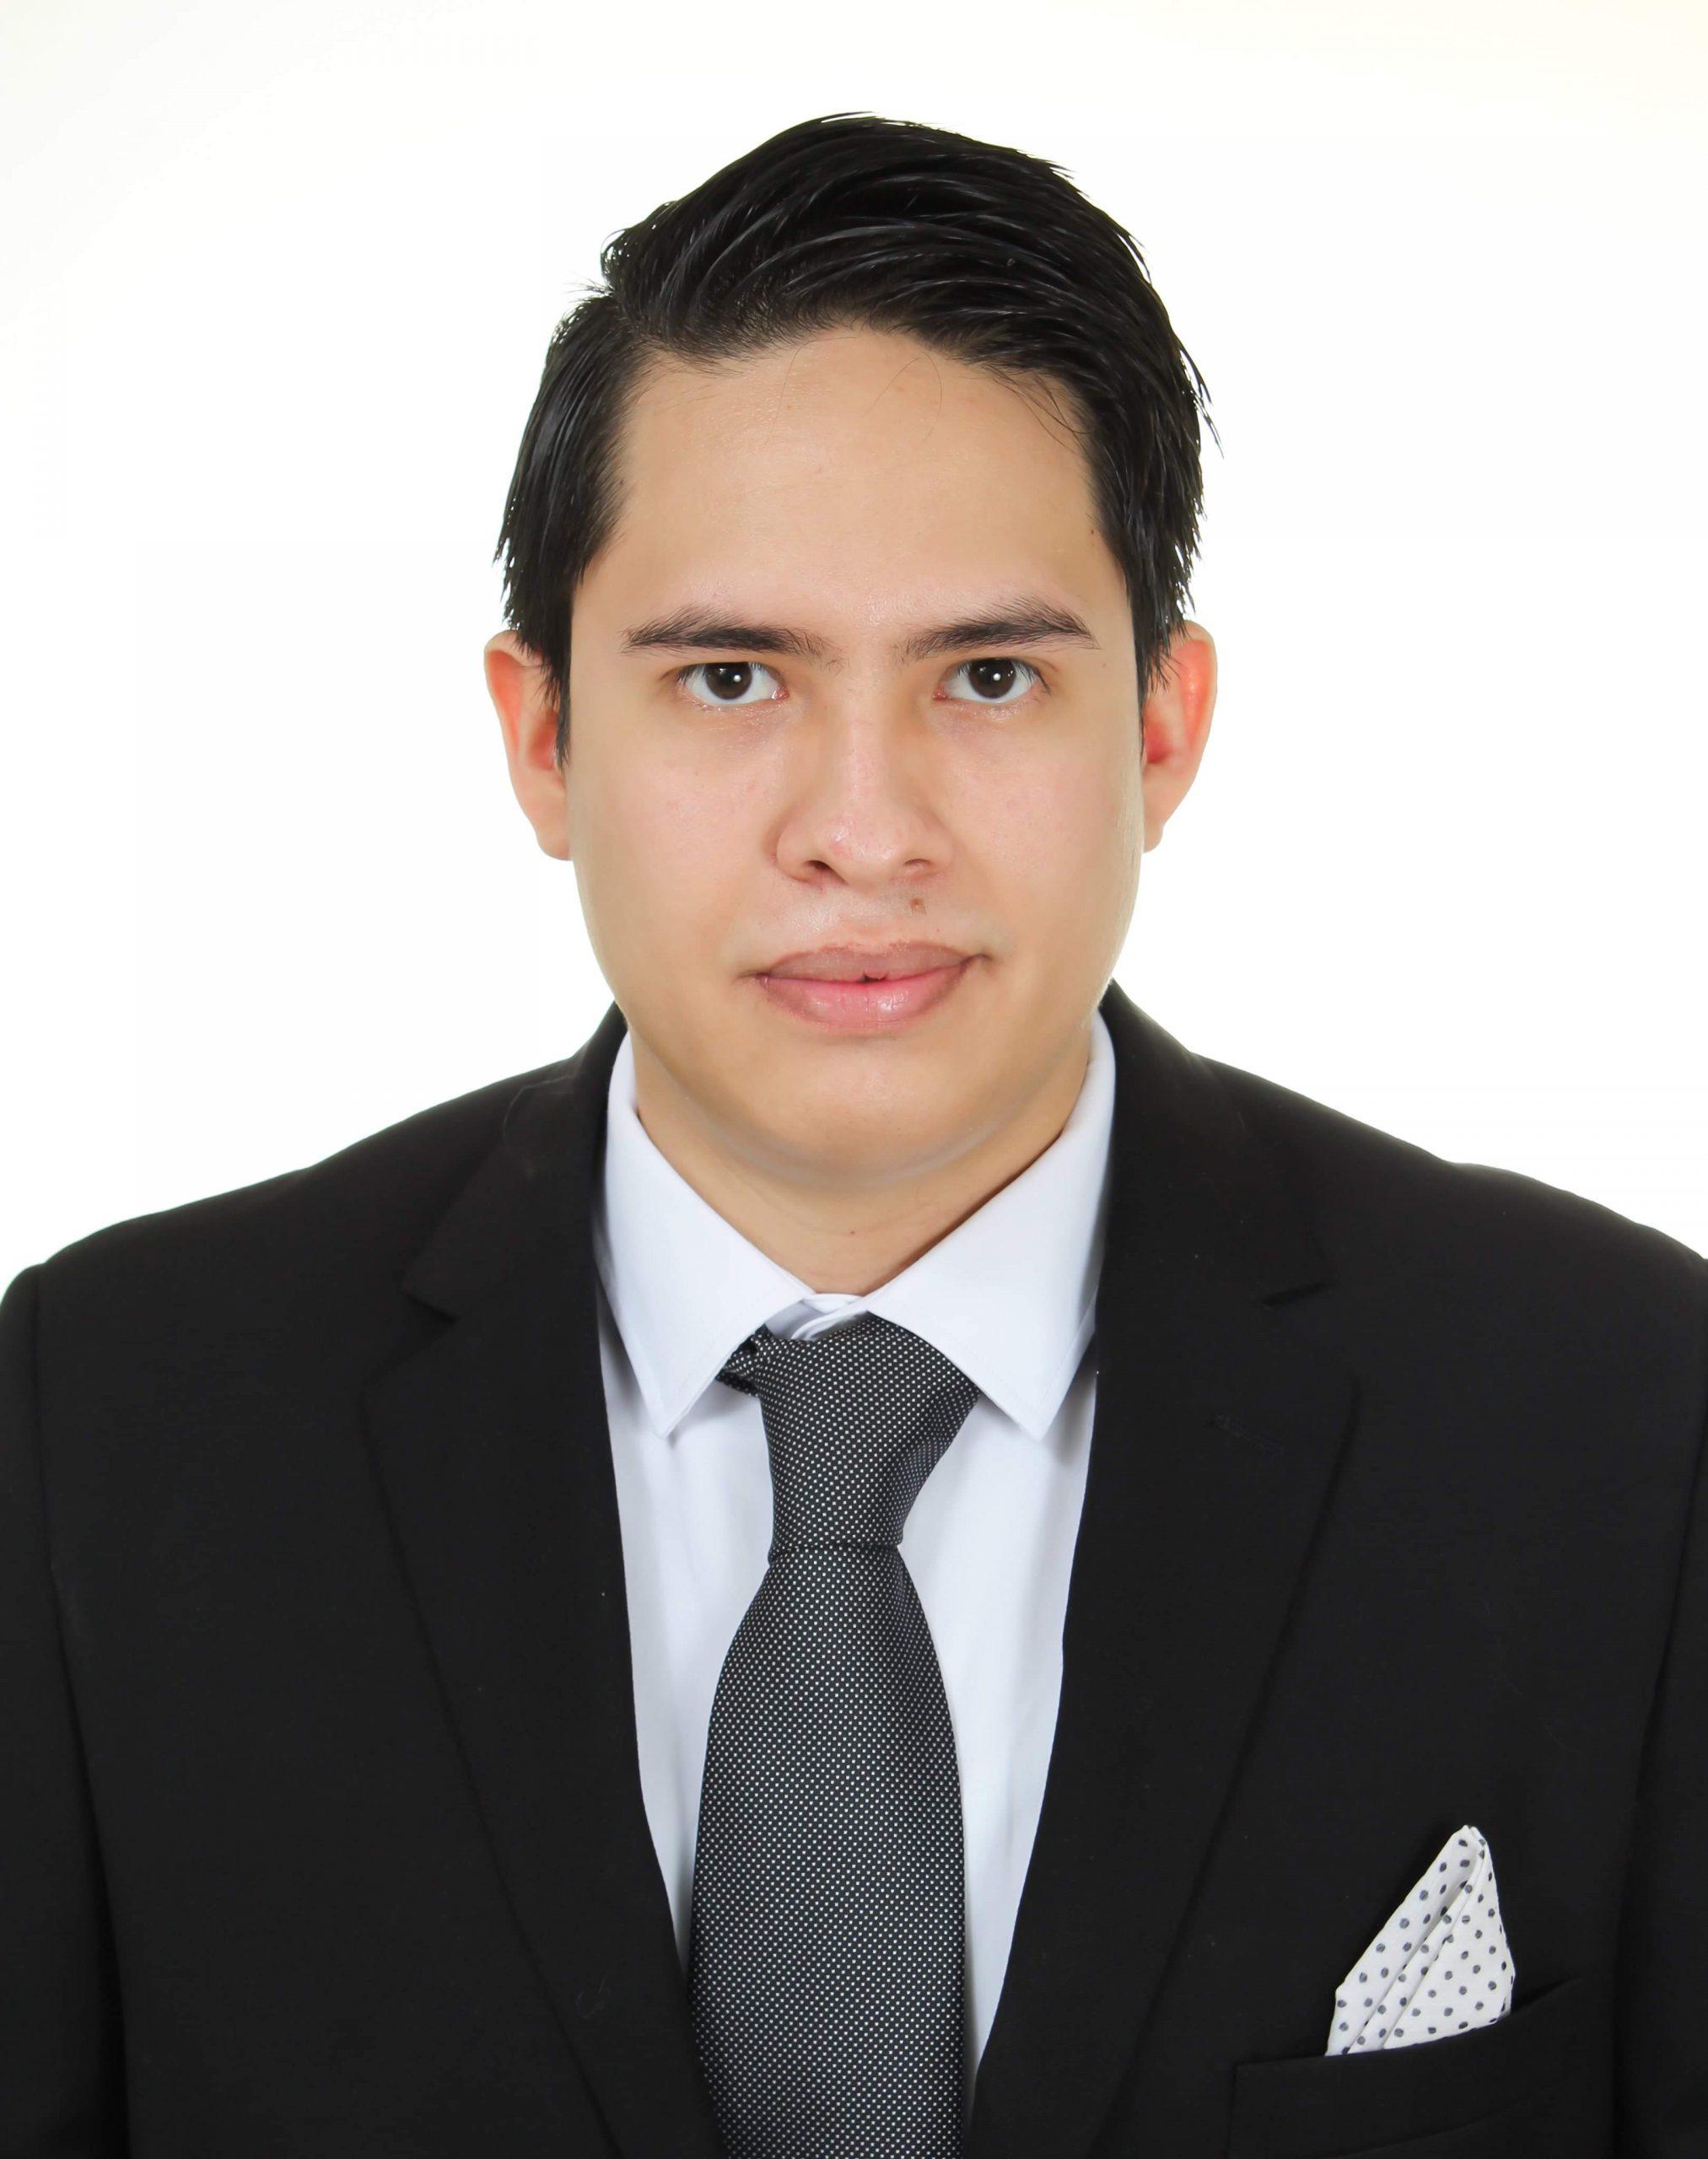 Rodrigo Enrique Avilés Grande